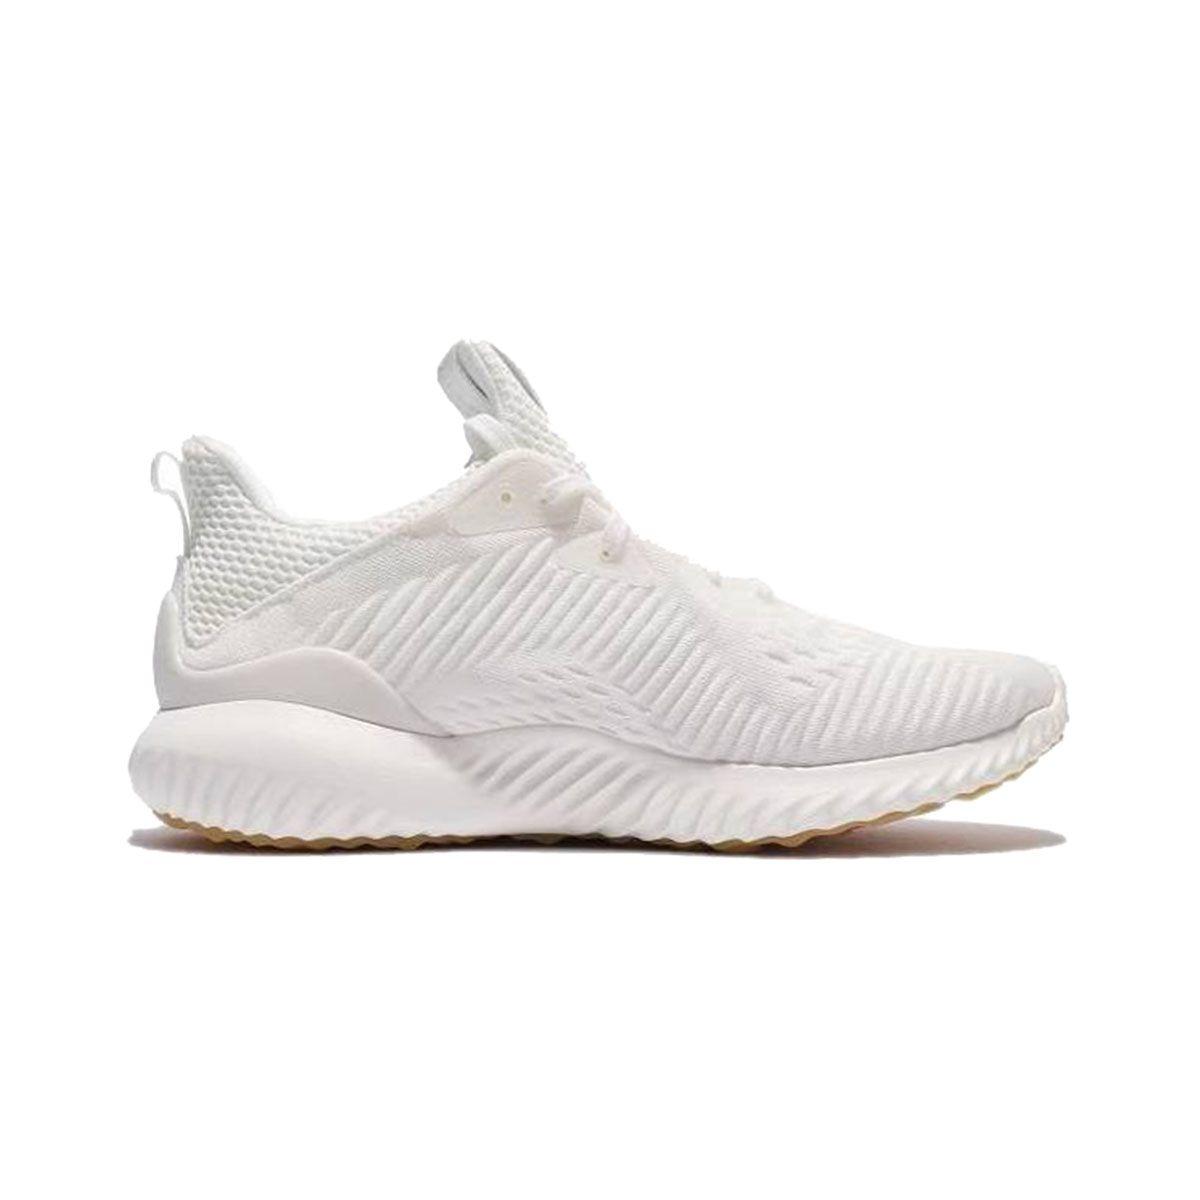 Adidas Adidas Alphabounce Em Undy Beyaz Kadin Sneaker Flo Ayakkabi Sneaker Adidas Kadin